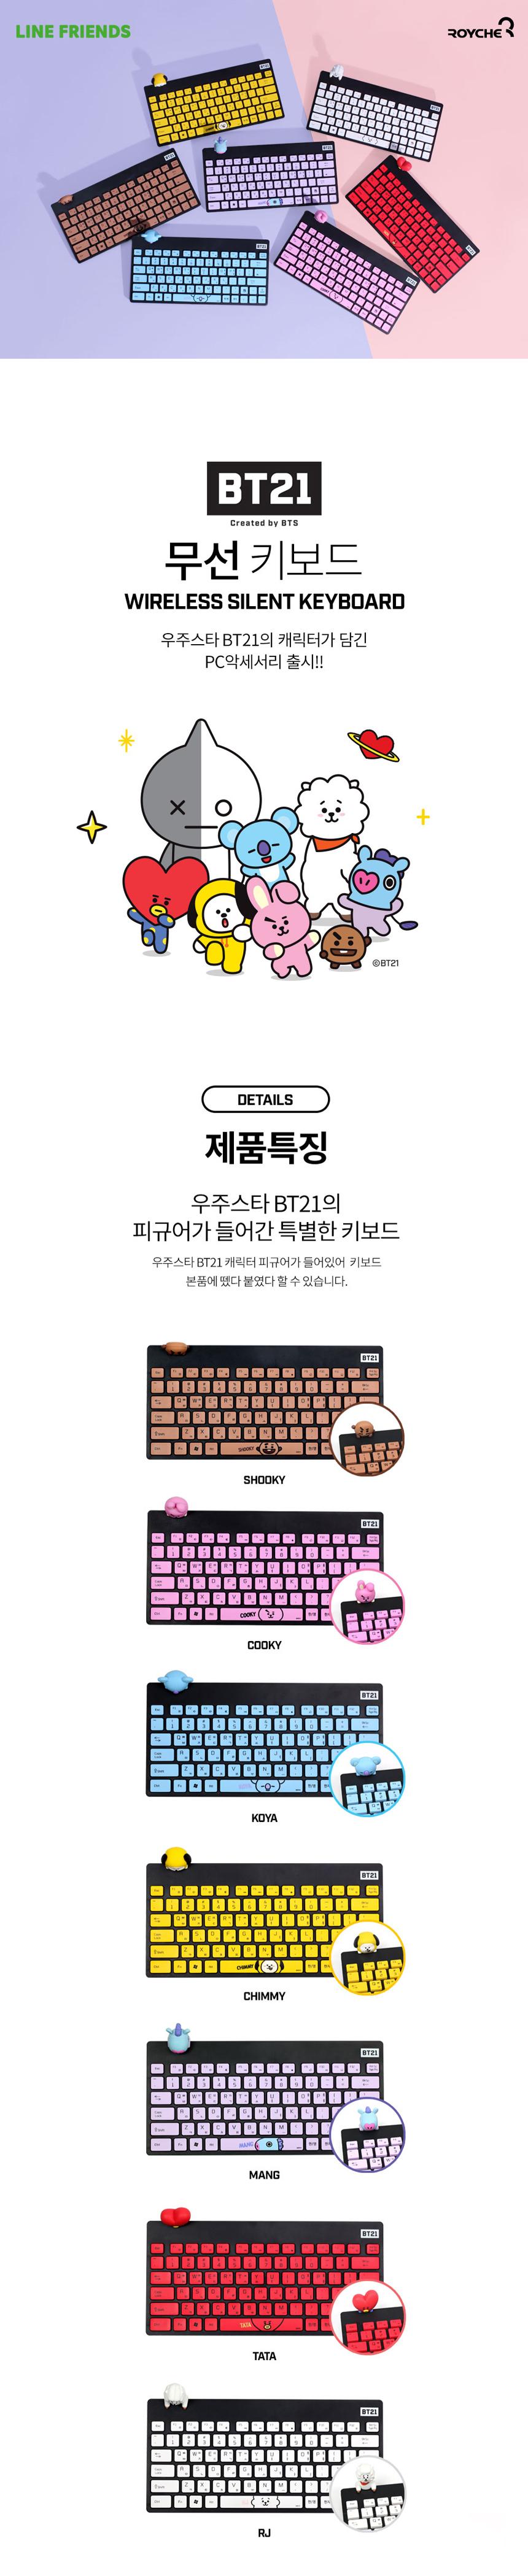 bt21_gm_keyboard_01.jpg